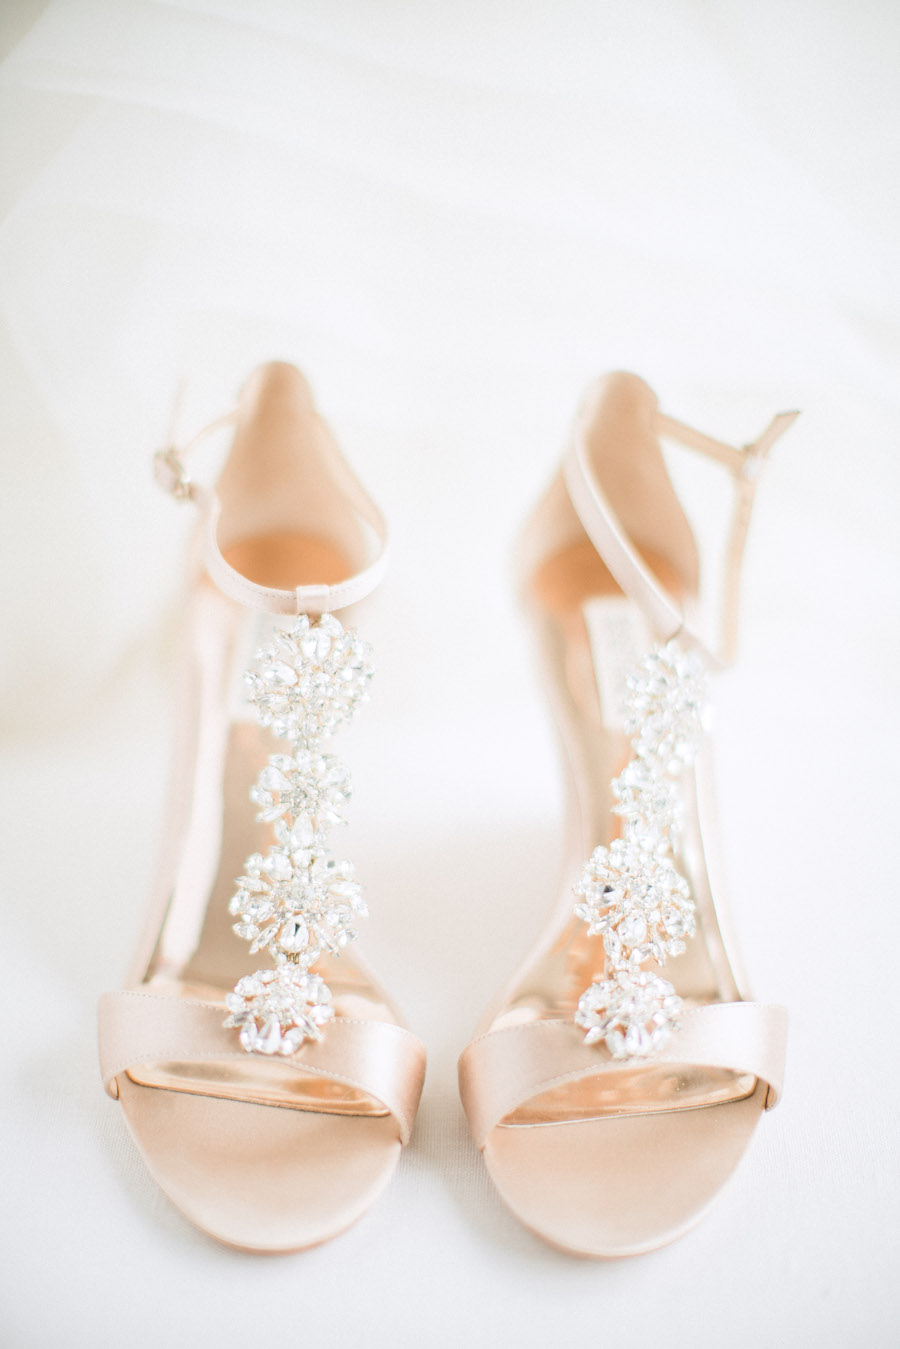 Badgley Mischka Leigh Embellished T Strap High Heel Sandals   Champagne Satin Jeweled Wedding Shoe